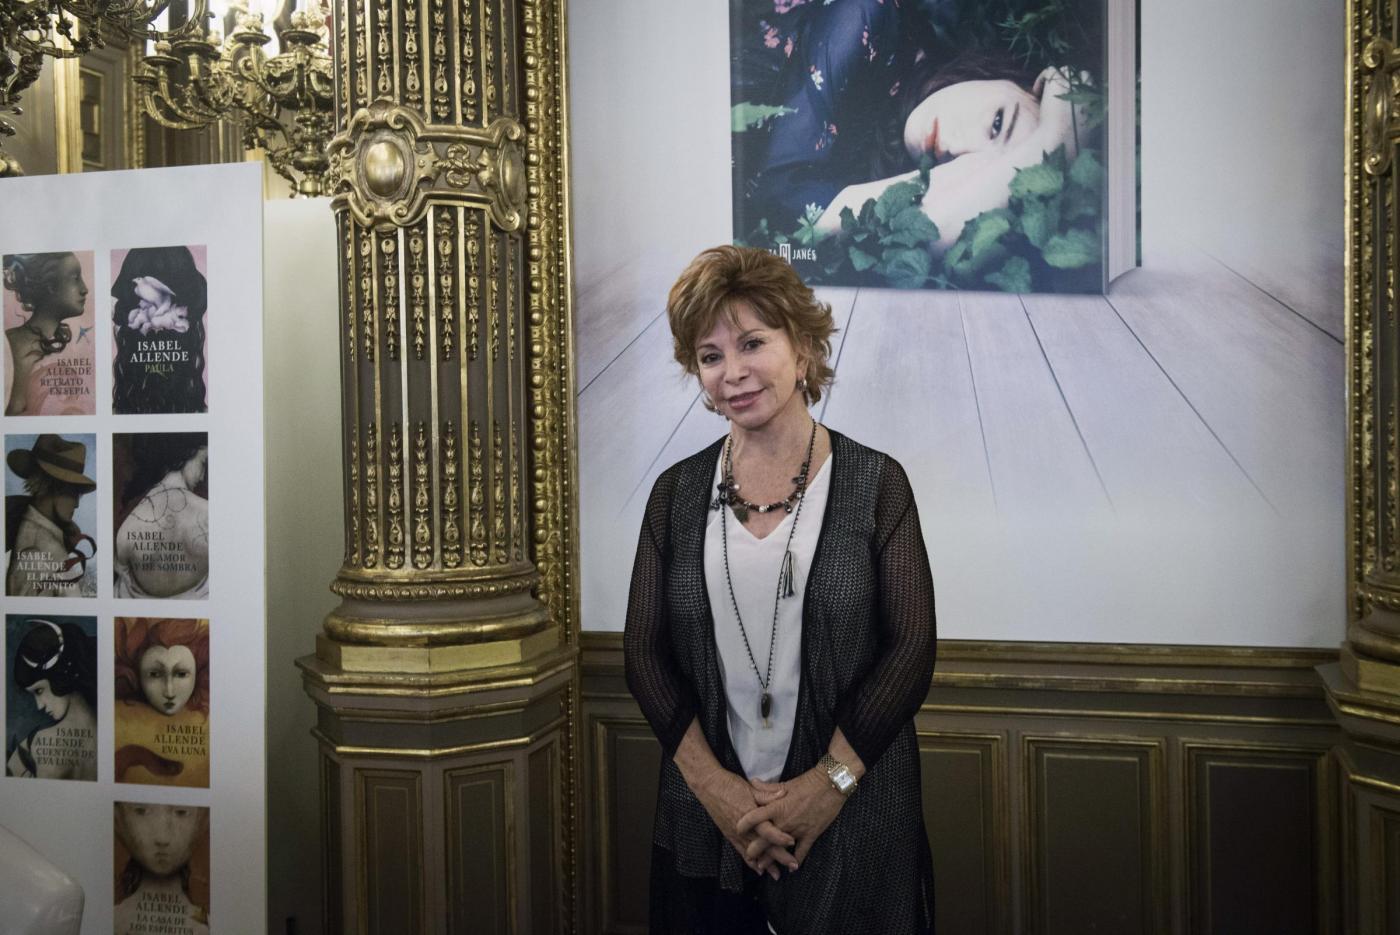 Isabel Allende, frasi dai libri più famosi